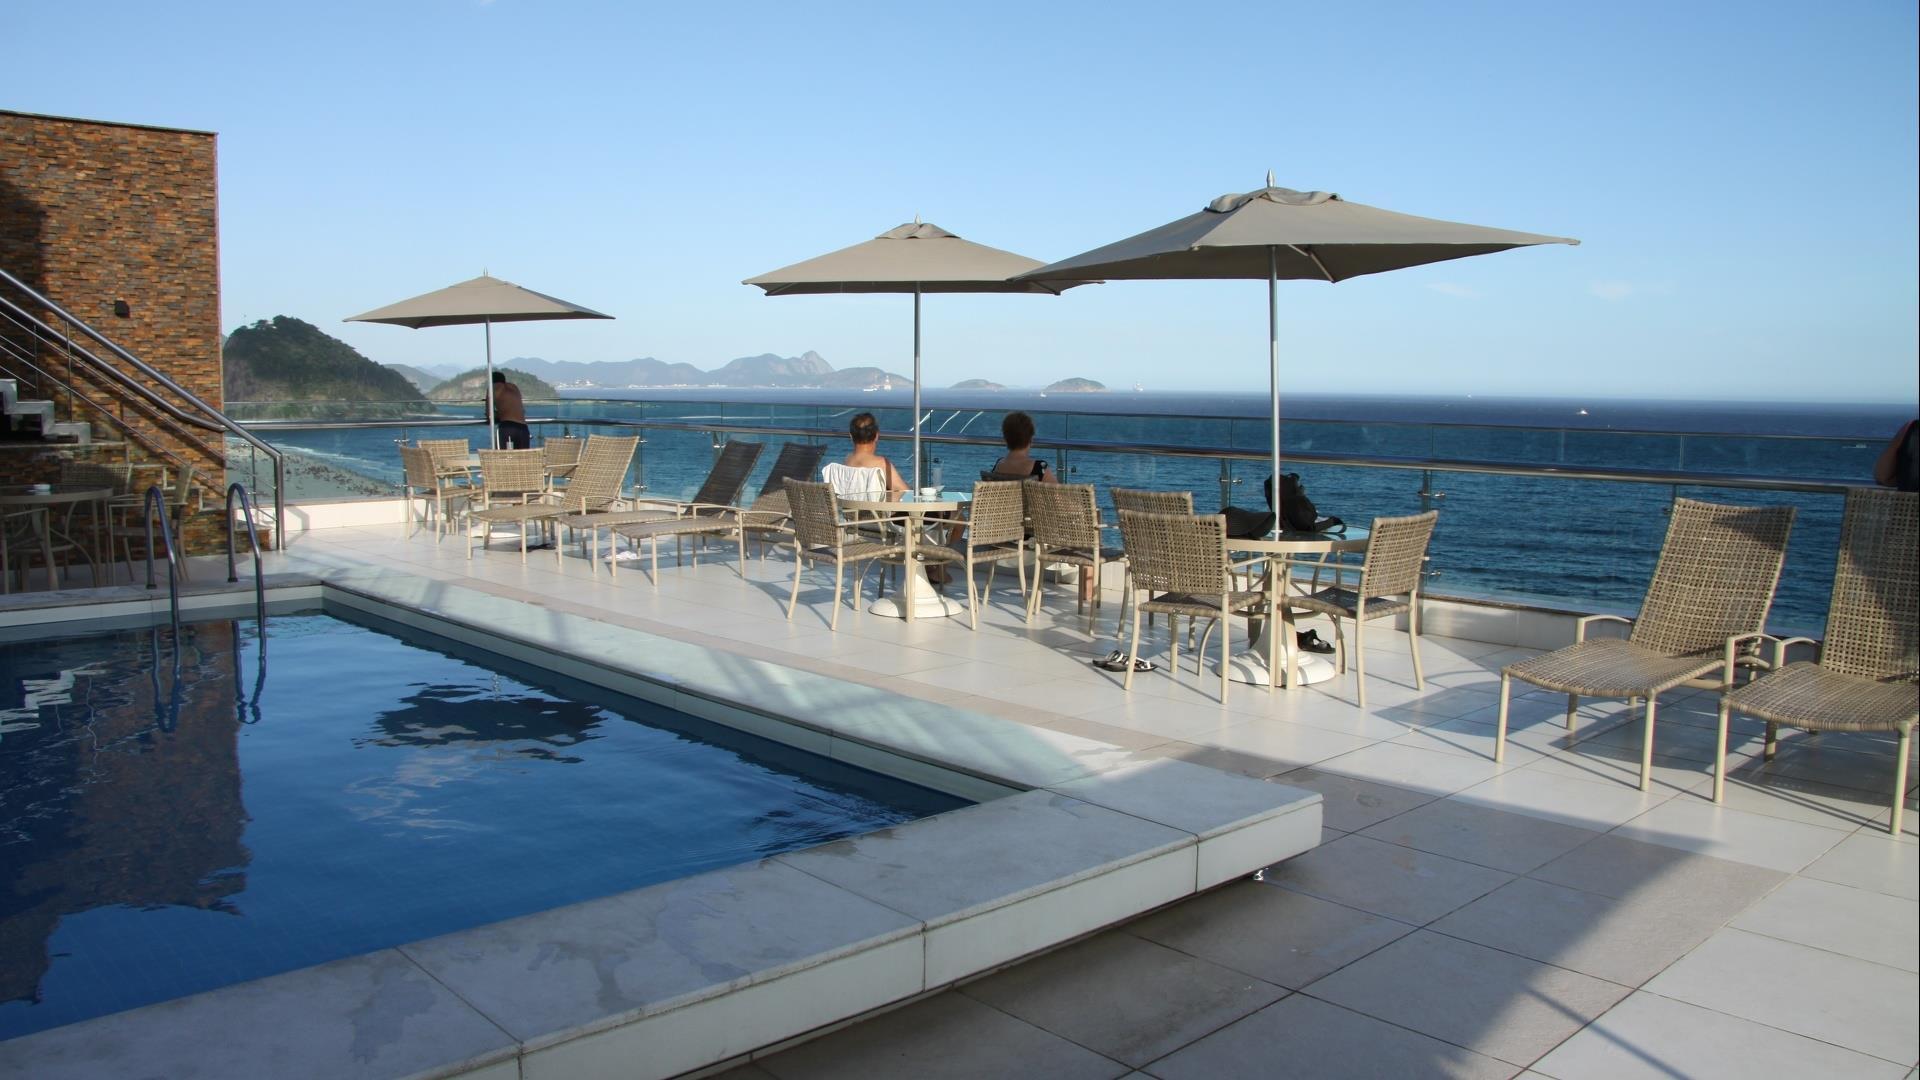 Brasilien Rio de Janeiro: Superior Hotel - Hotel Arena Copacabana